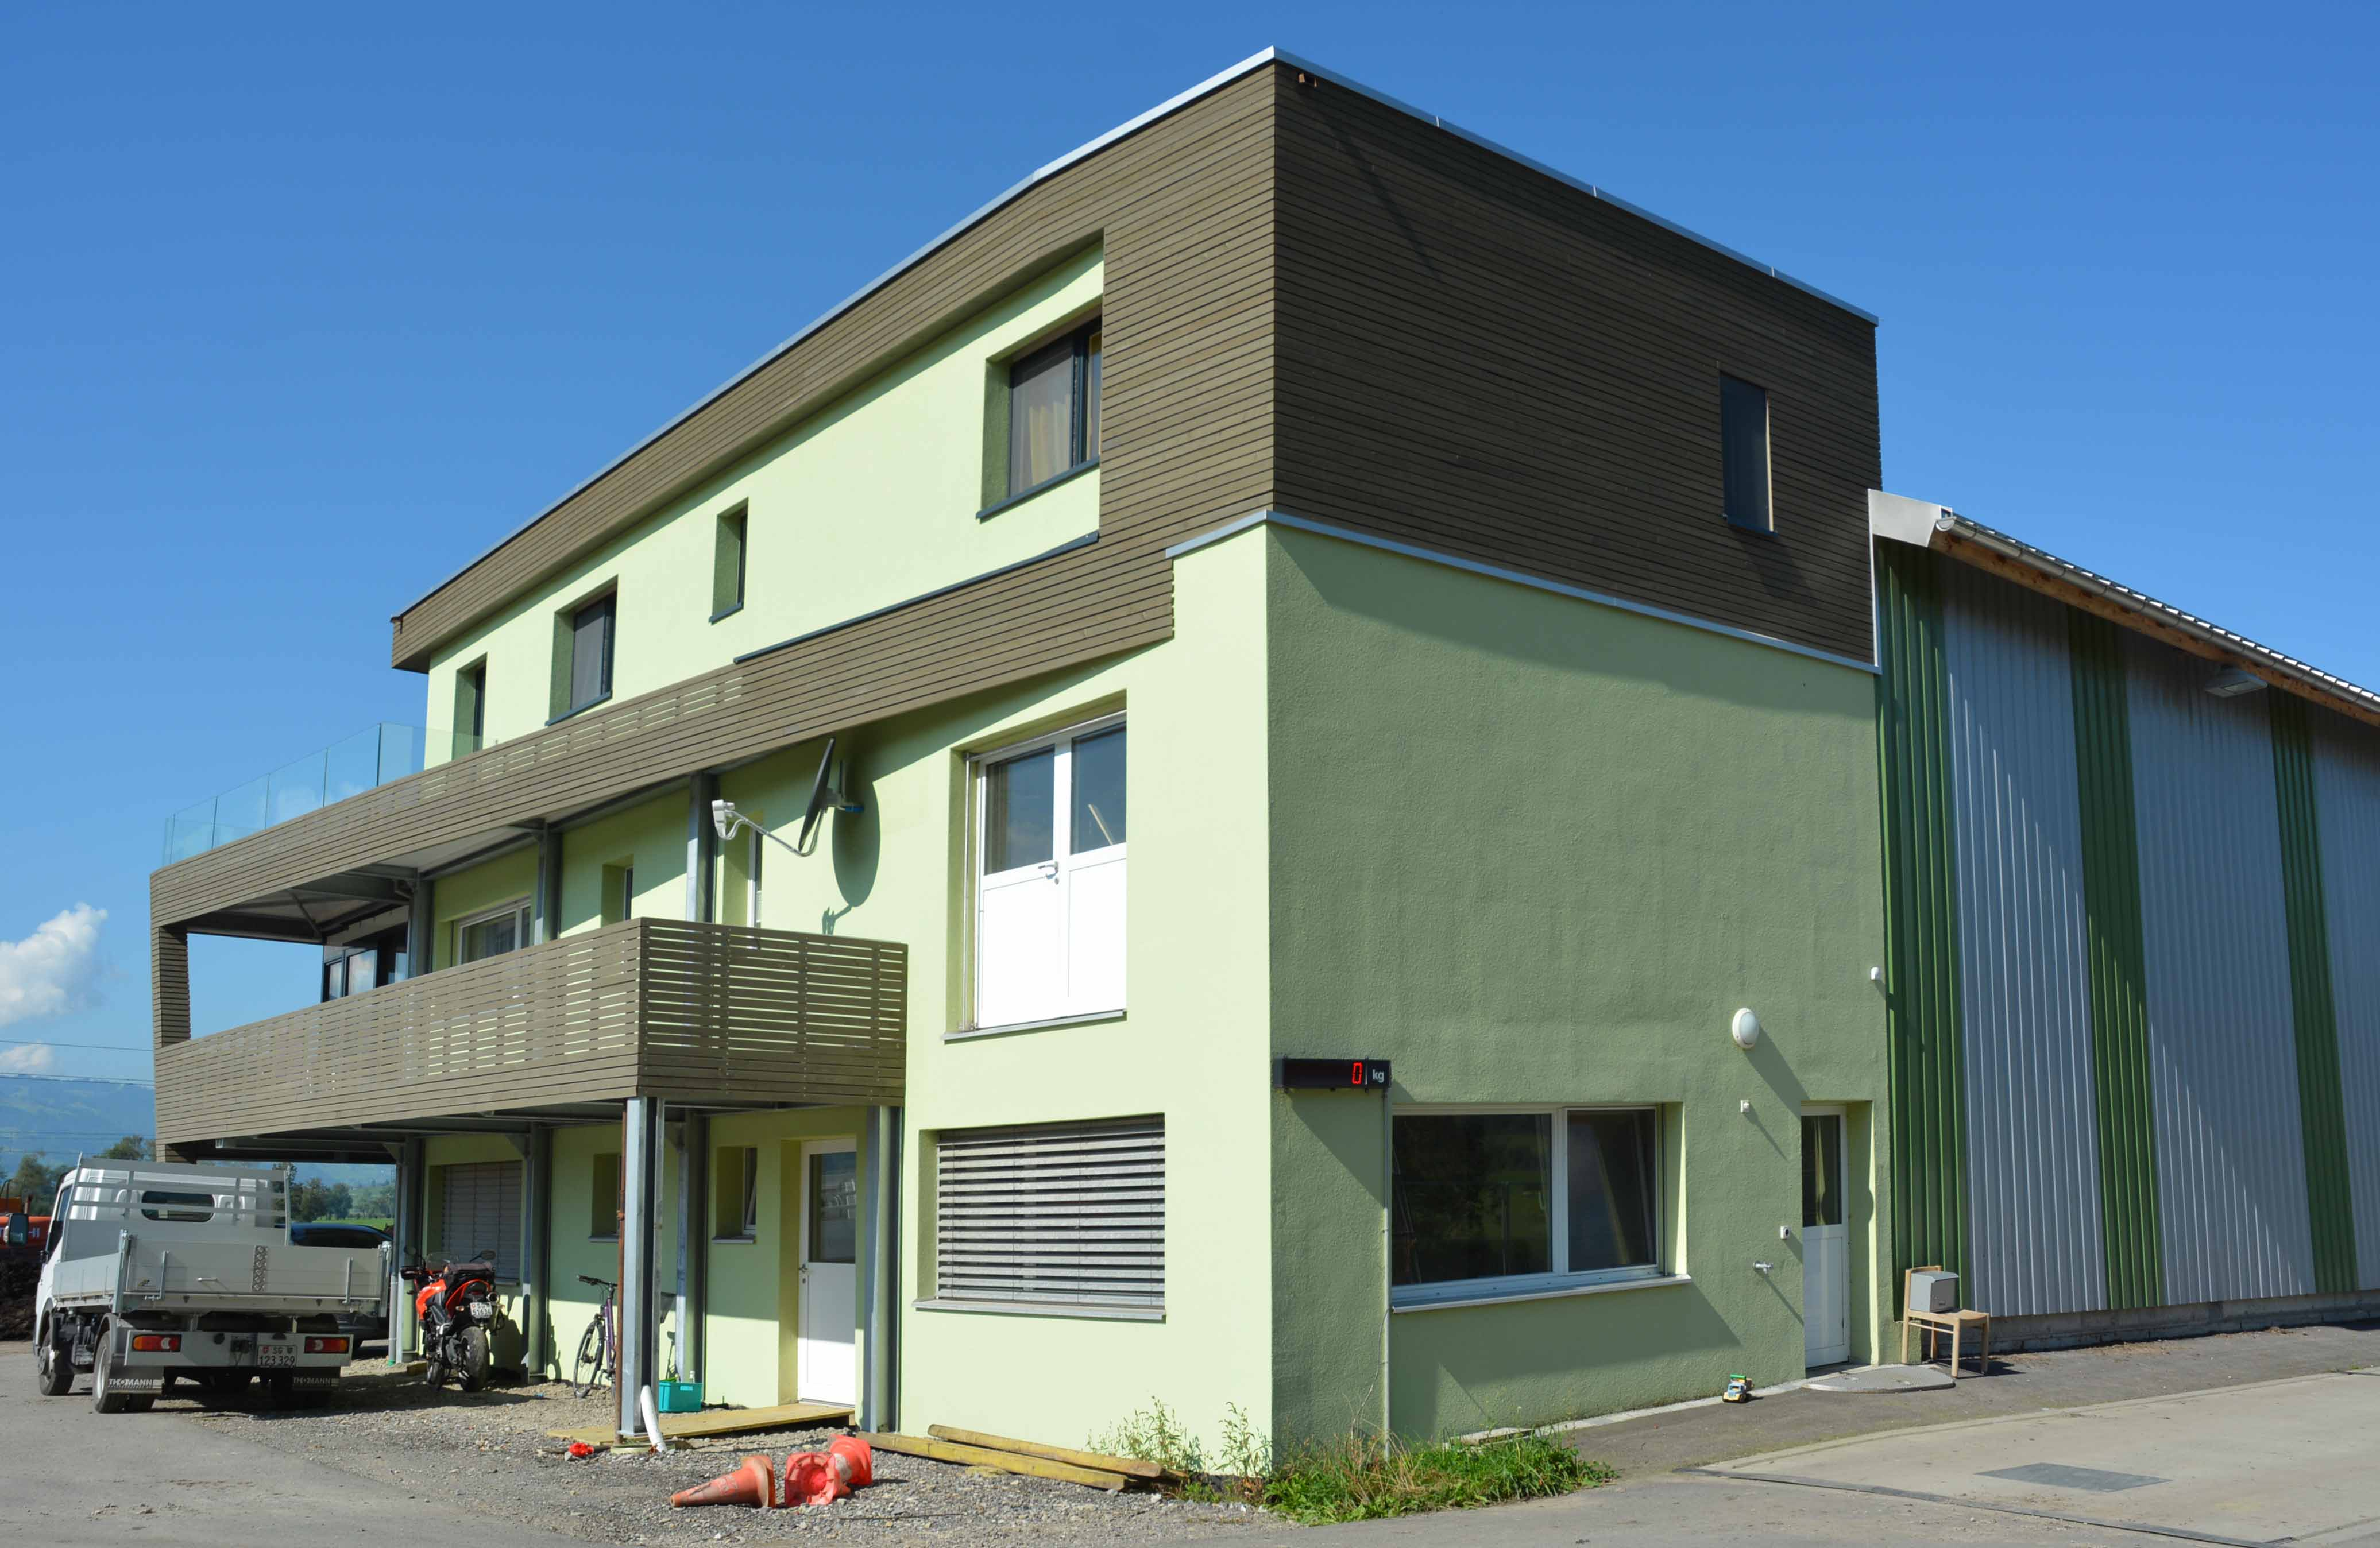 Neubau modern moderne Architektur grün Holz Materialien Kaltbrunn Benken Kompostieranlage Ronner Bauleitung Planung